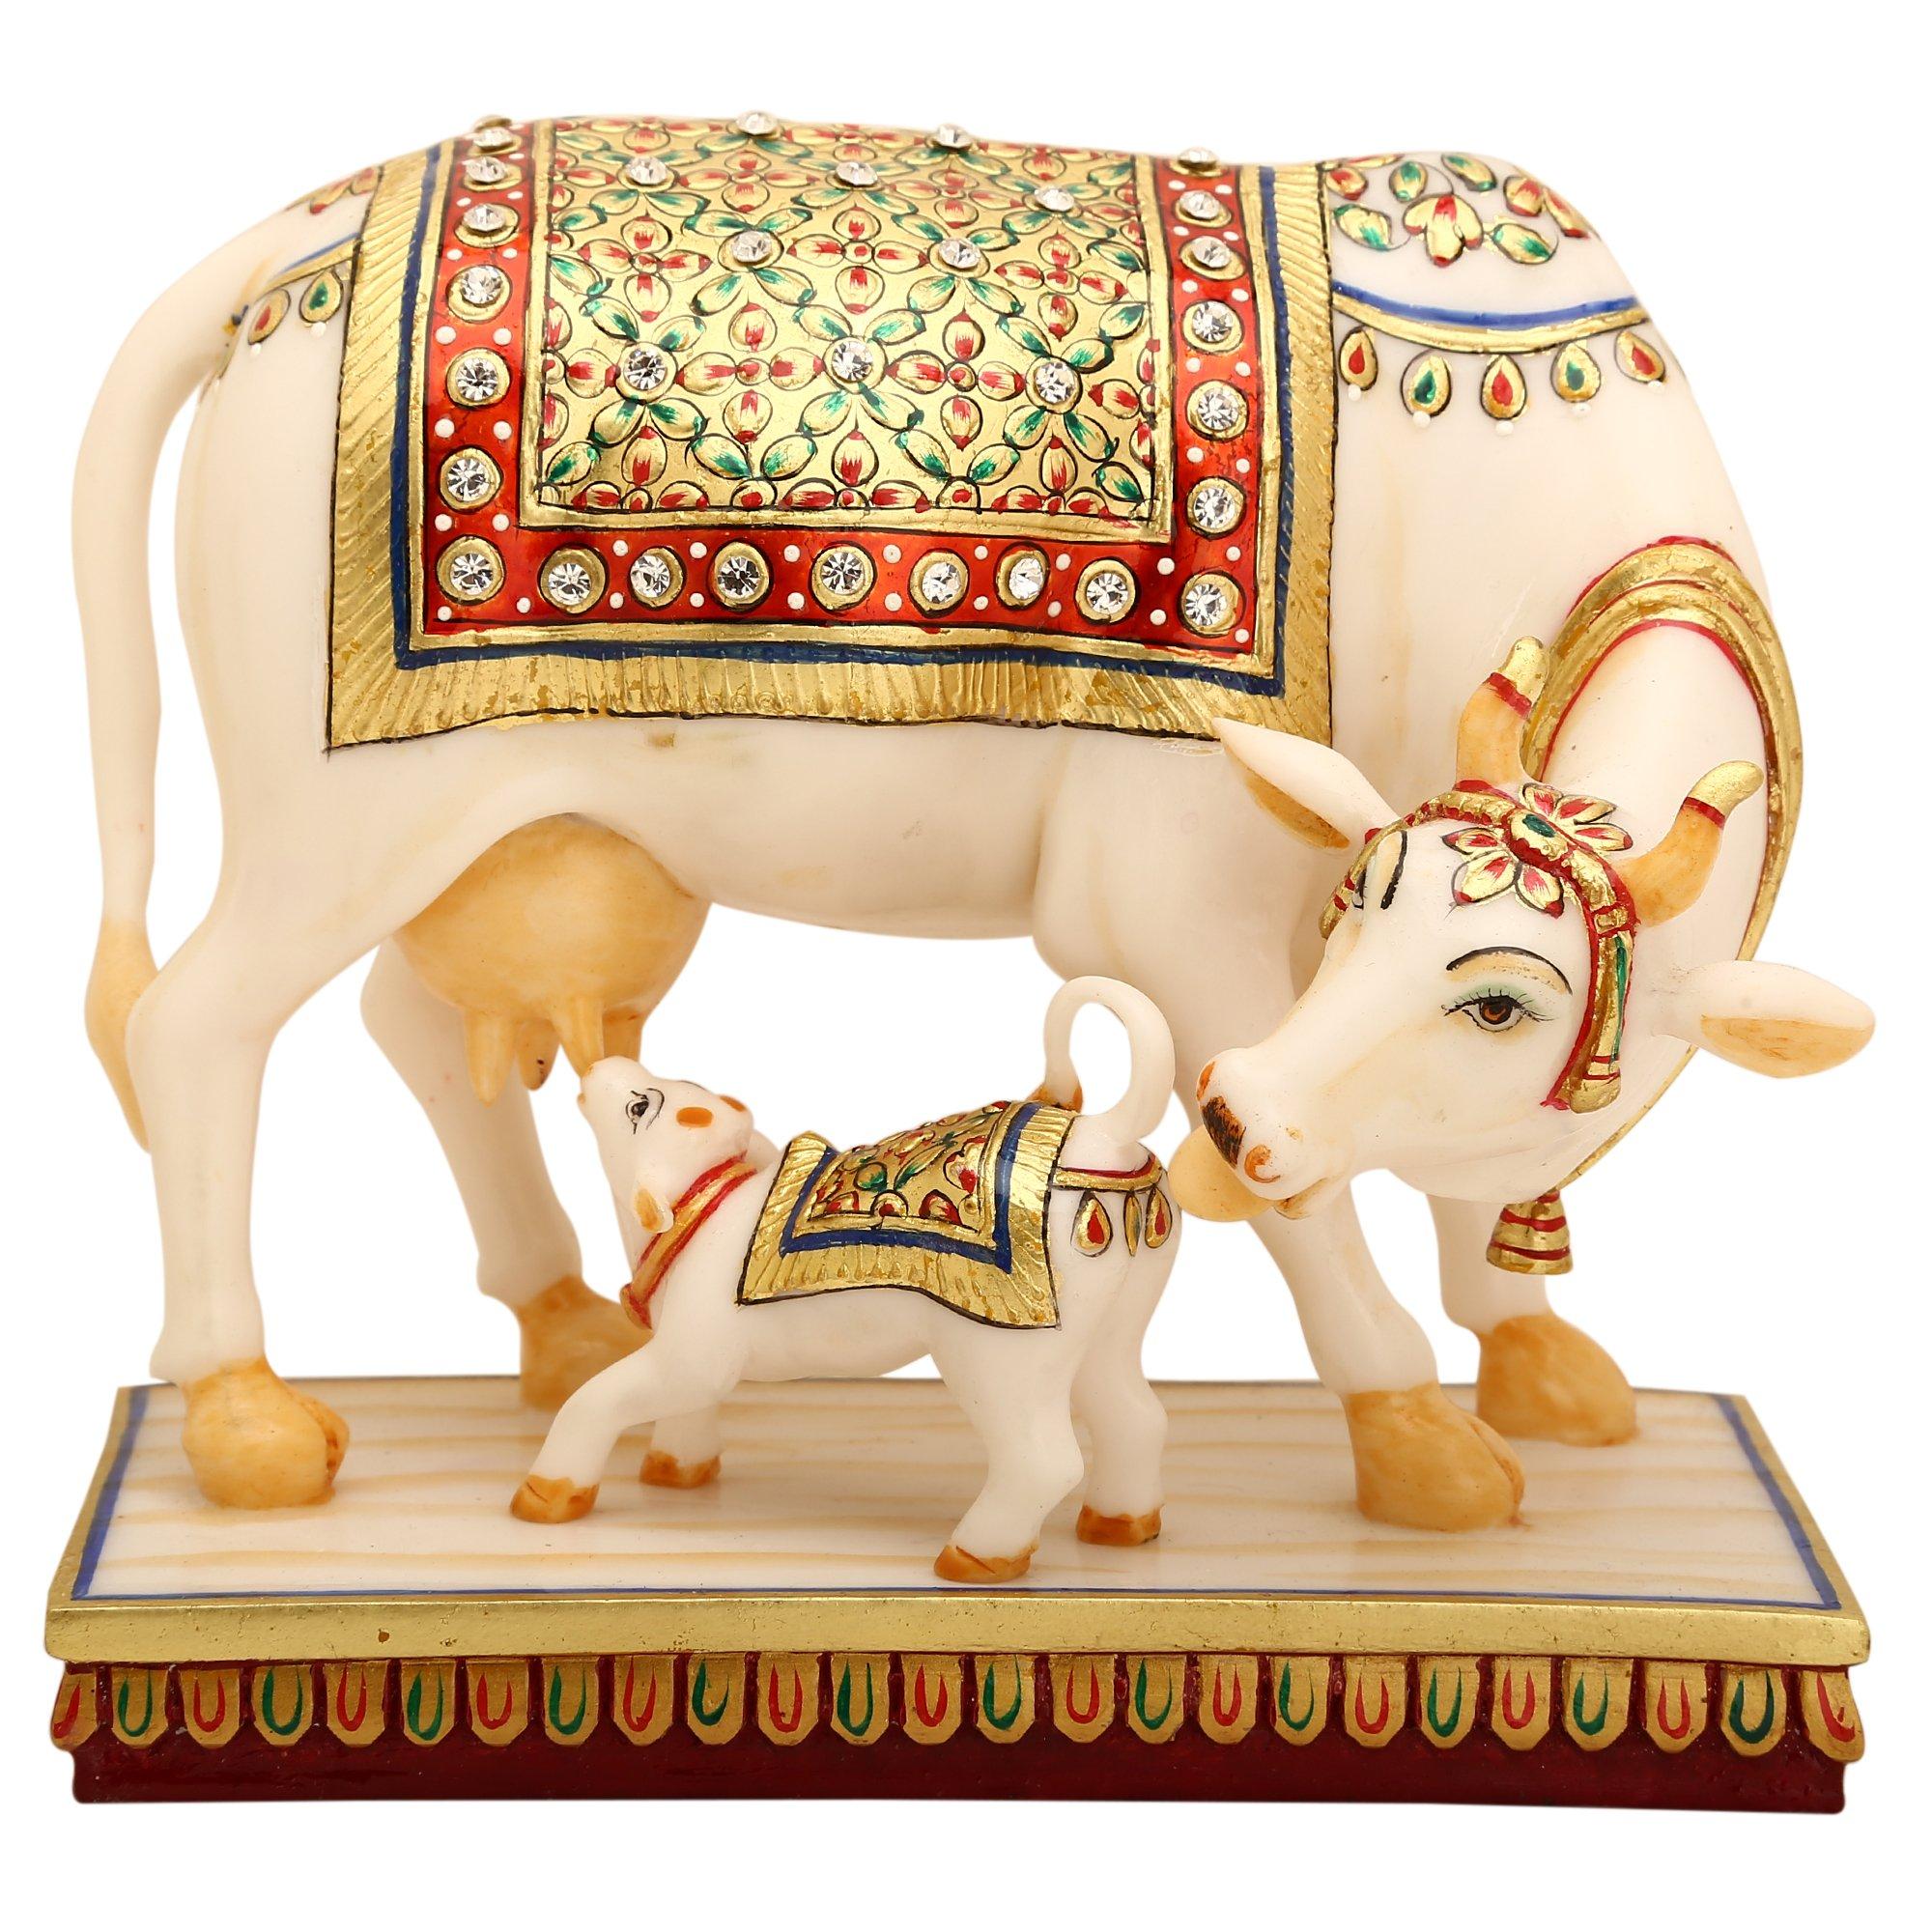 shivika enterprises Marble Dust Kamdhenu Cow & Calf Brass Sculpture- Religious Kamdhenu Cow Calf Statue-Mother Child Love